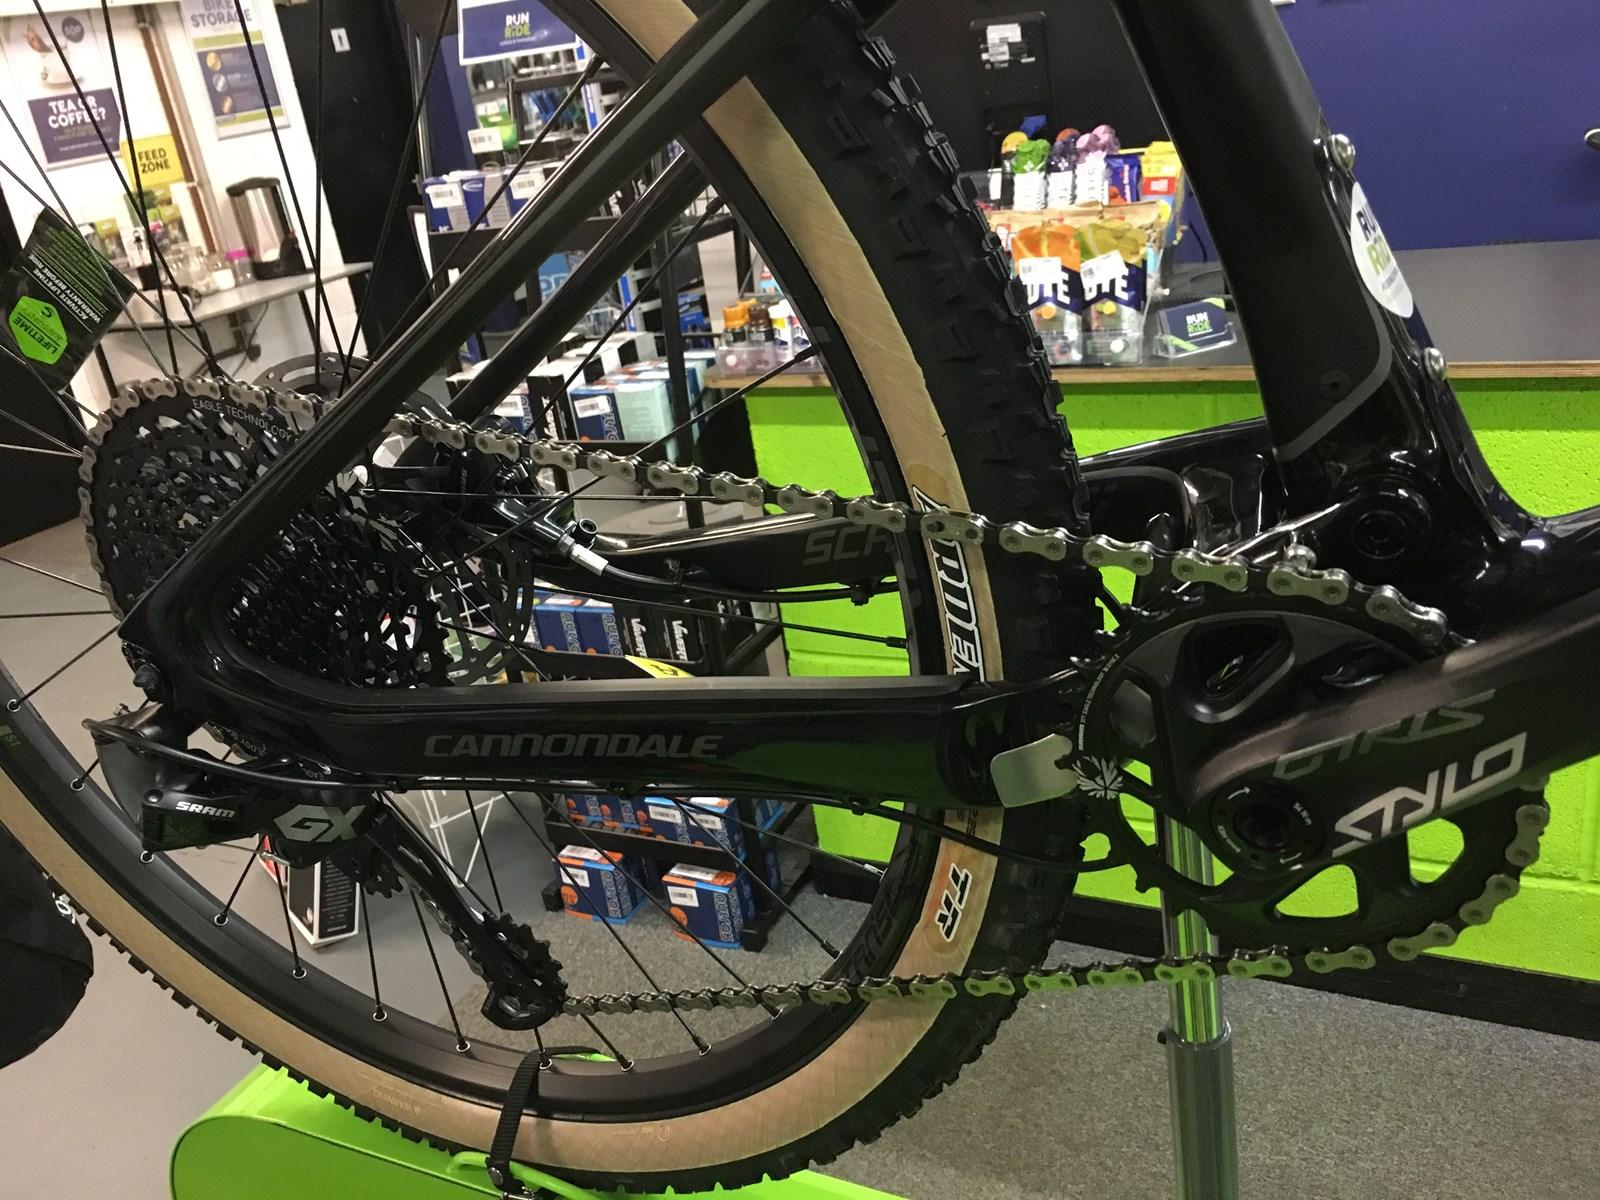 2018 Cannondale Scalpel Se 2 Carbon Full Suspension Mountain Bike